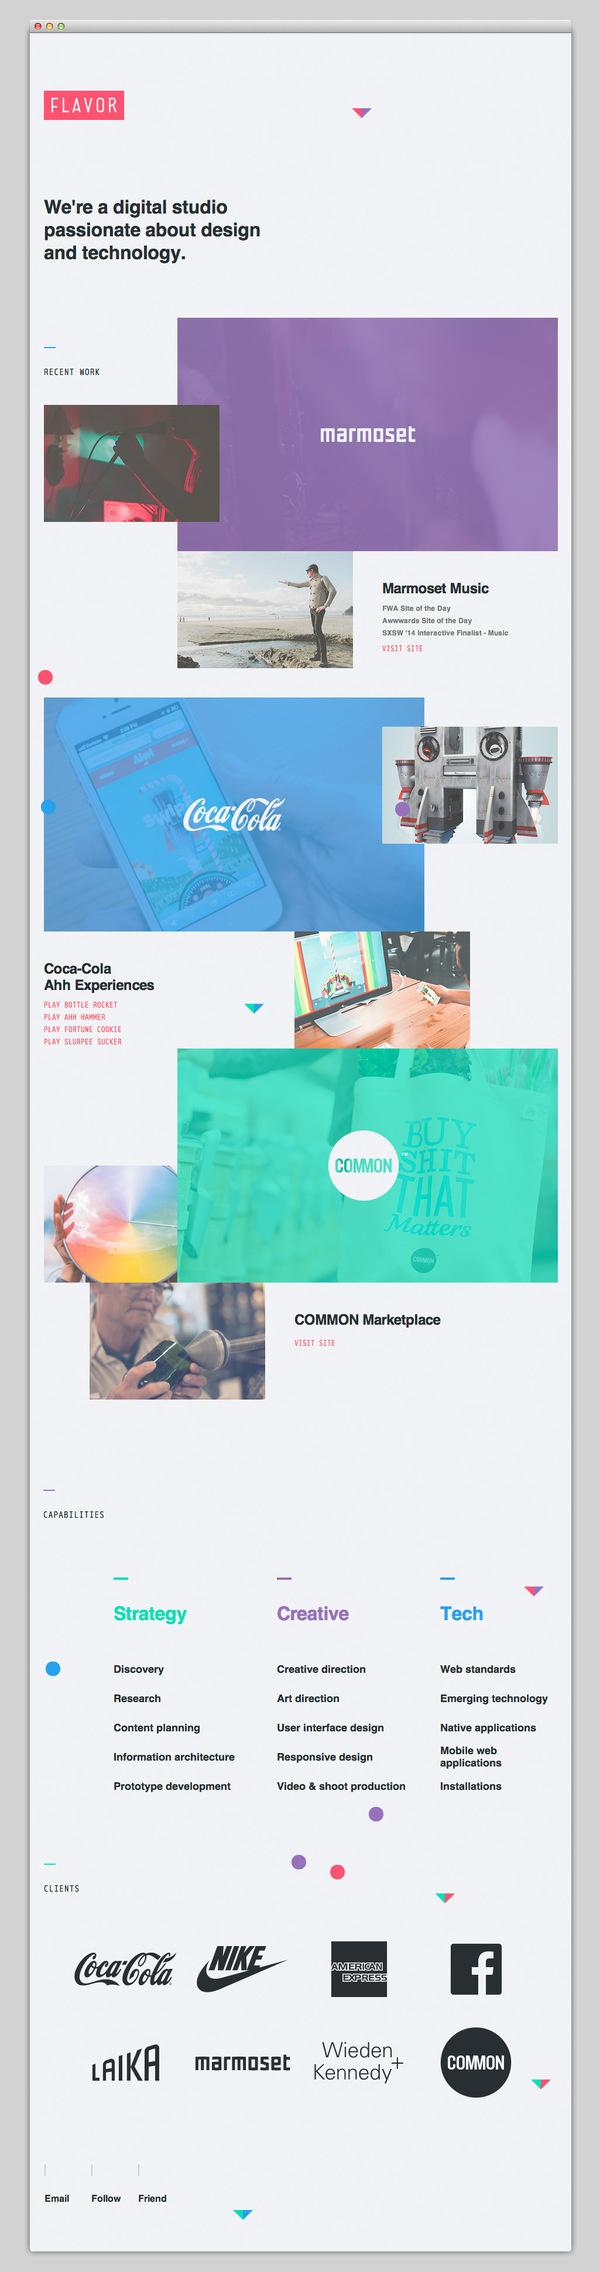 Flavor #website #layout #design #web